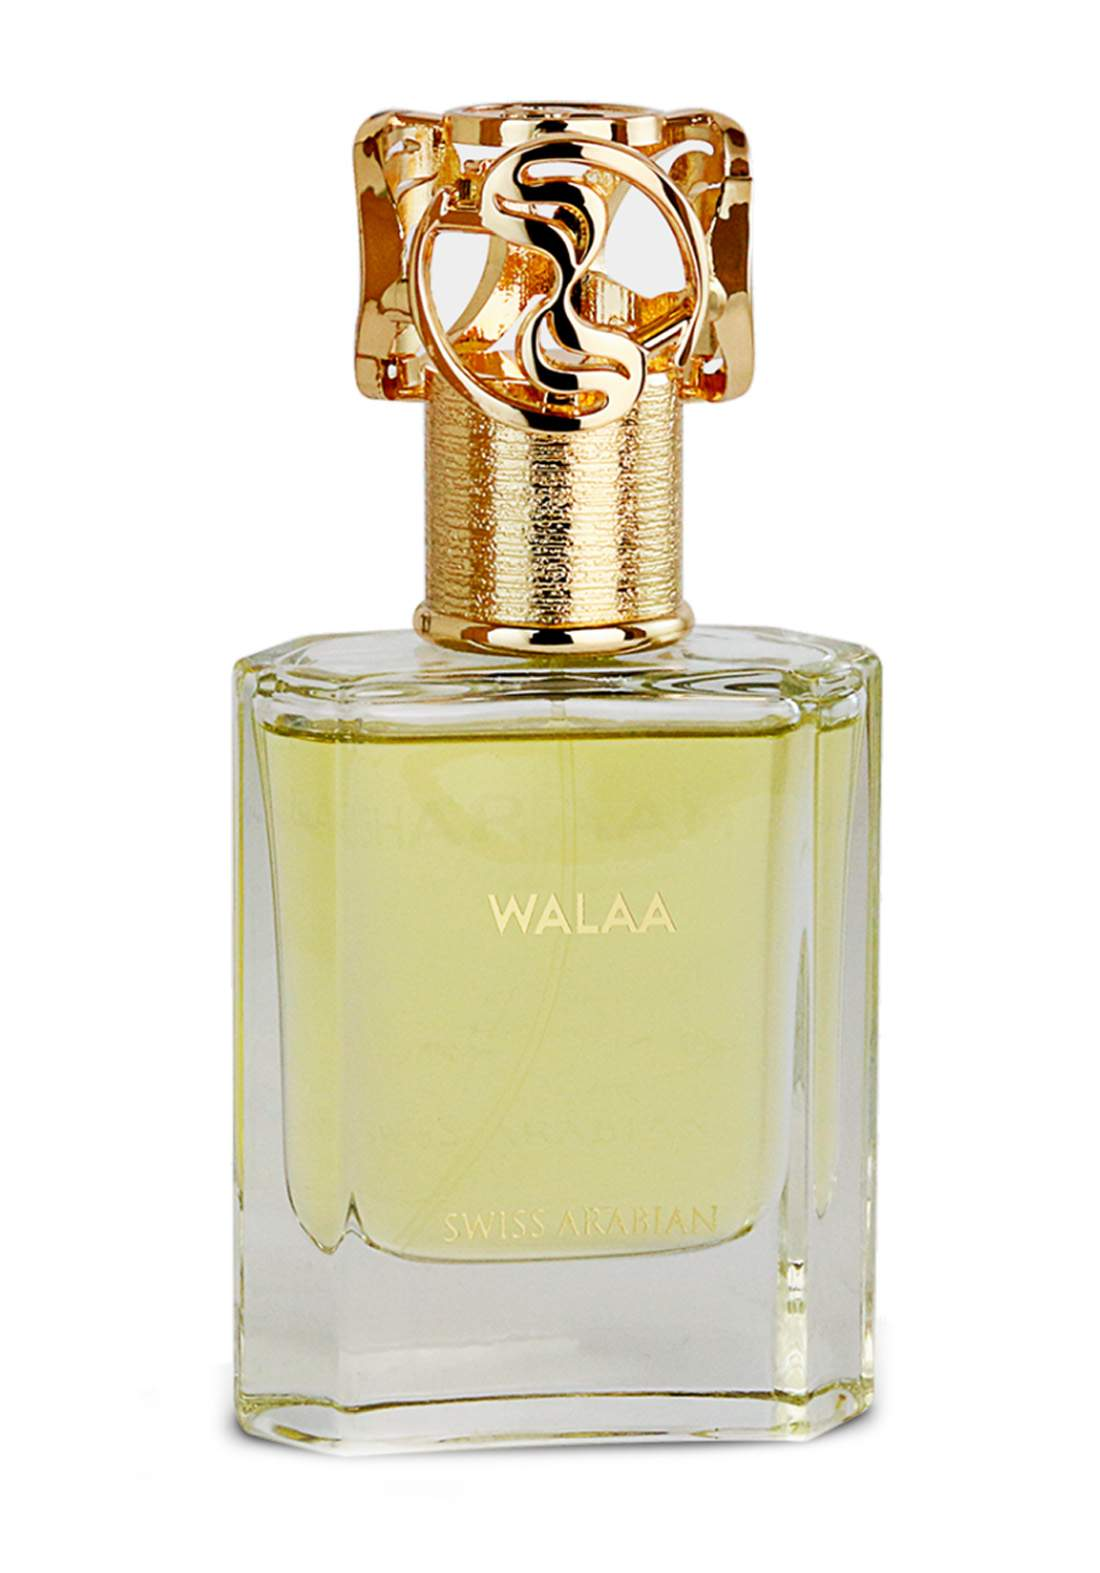 Swiss Arabian  1080 Walaa  Eau De Parfum Spray for Unisex  50 ml عطر  لكلا الجنسين